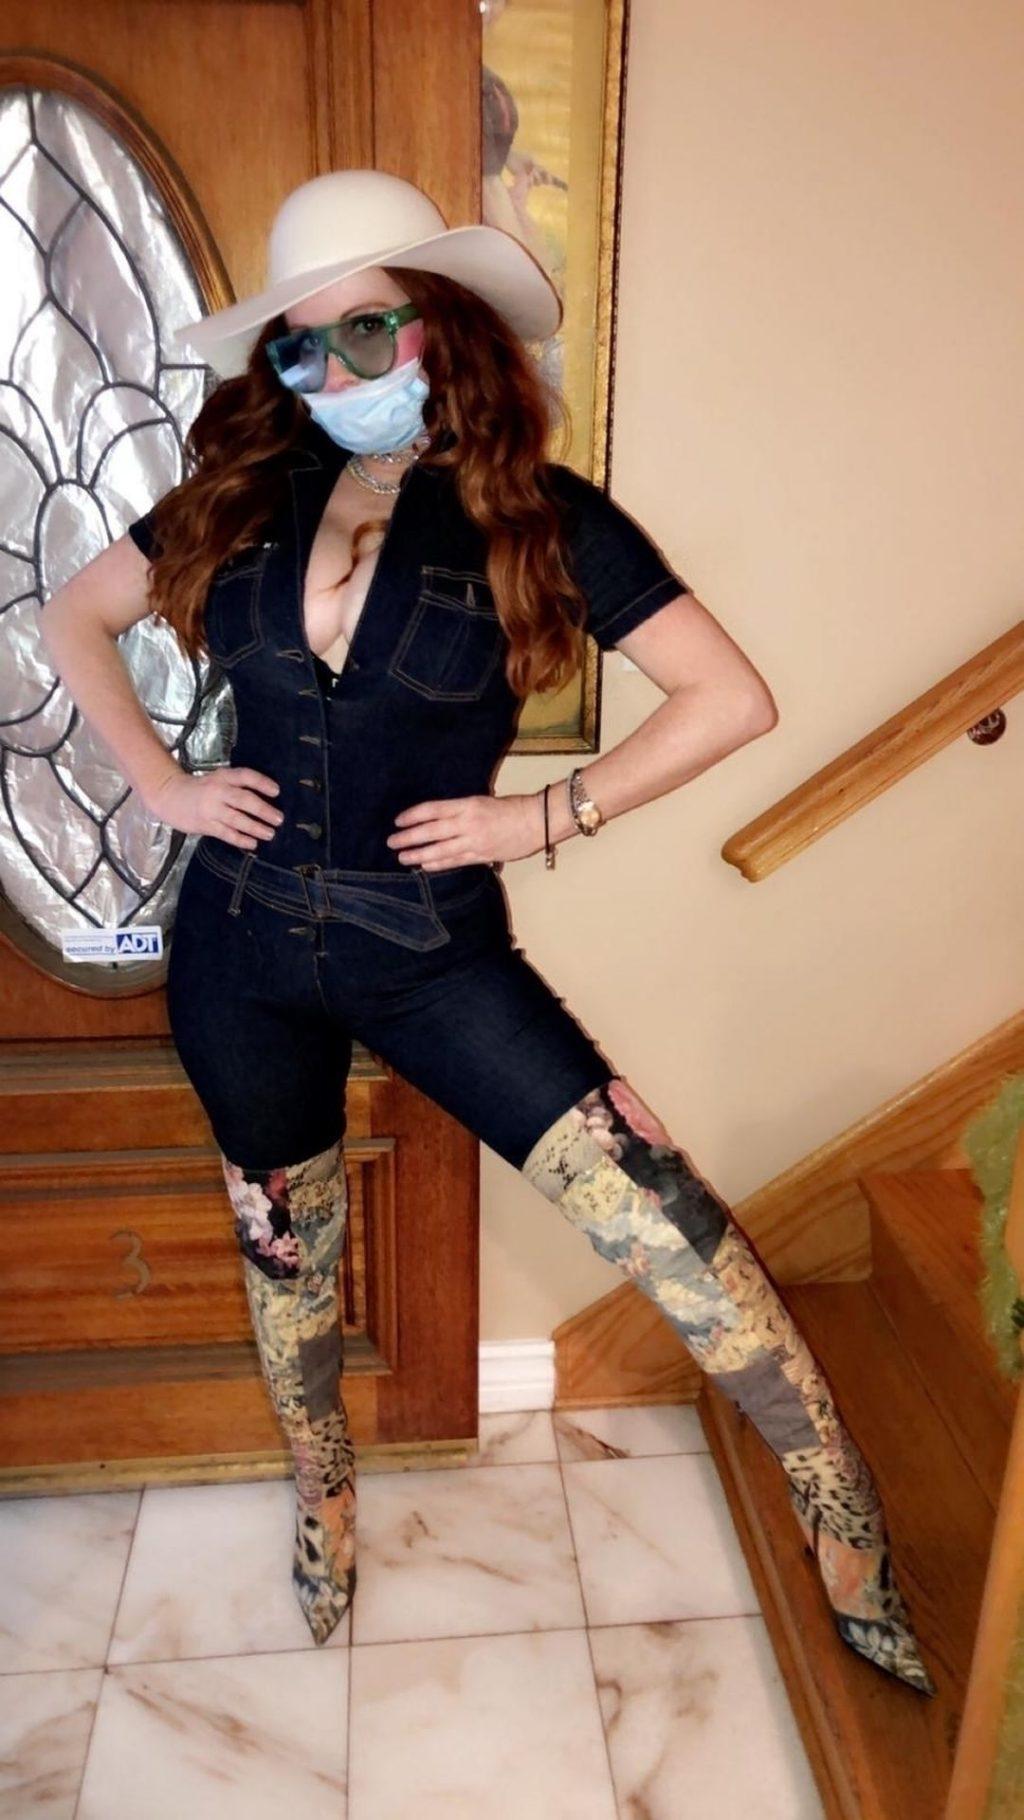 Phoebe Price Poses for Photos in her Coronavirus Mask (21 Photos)